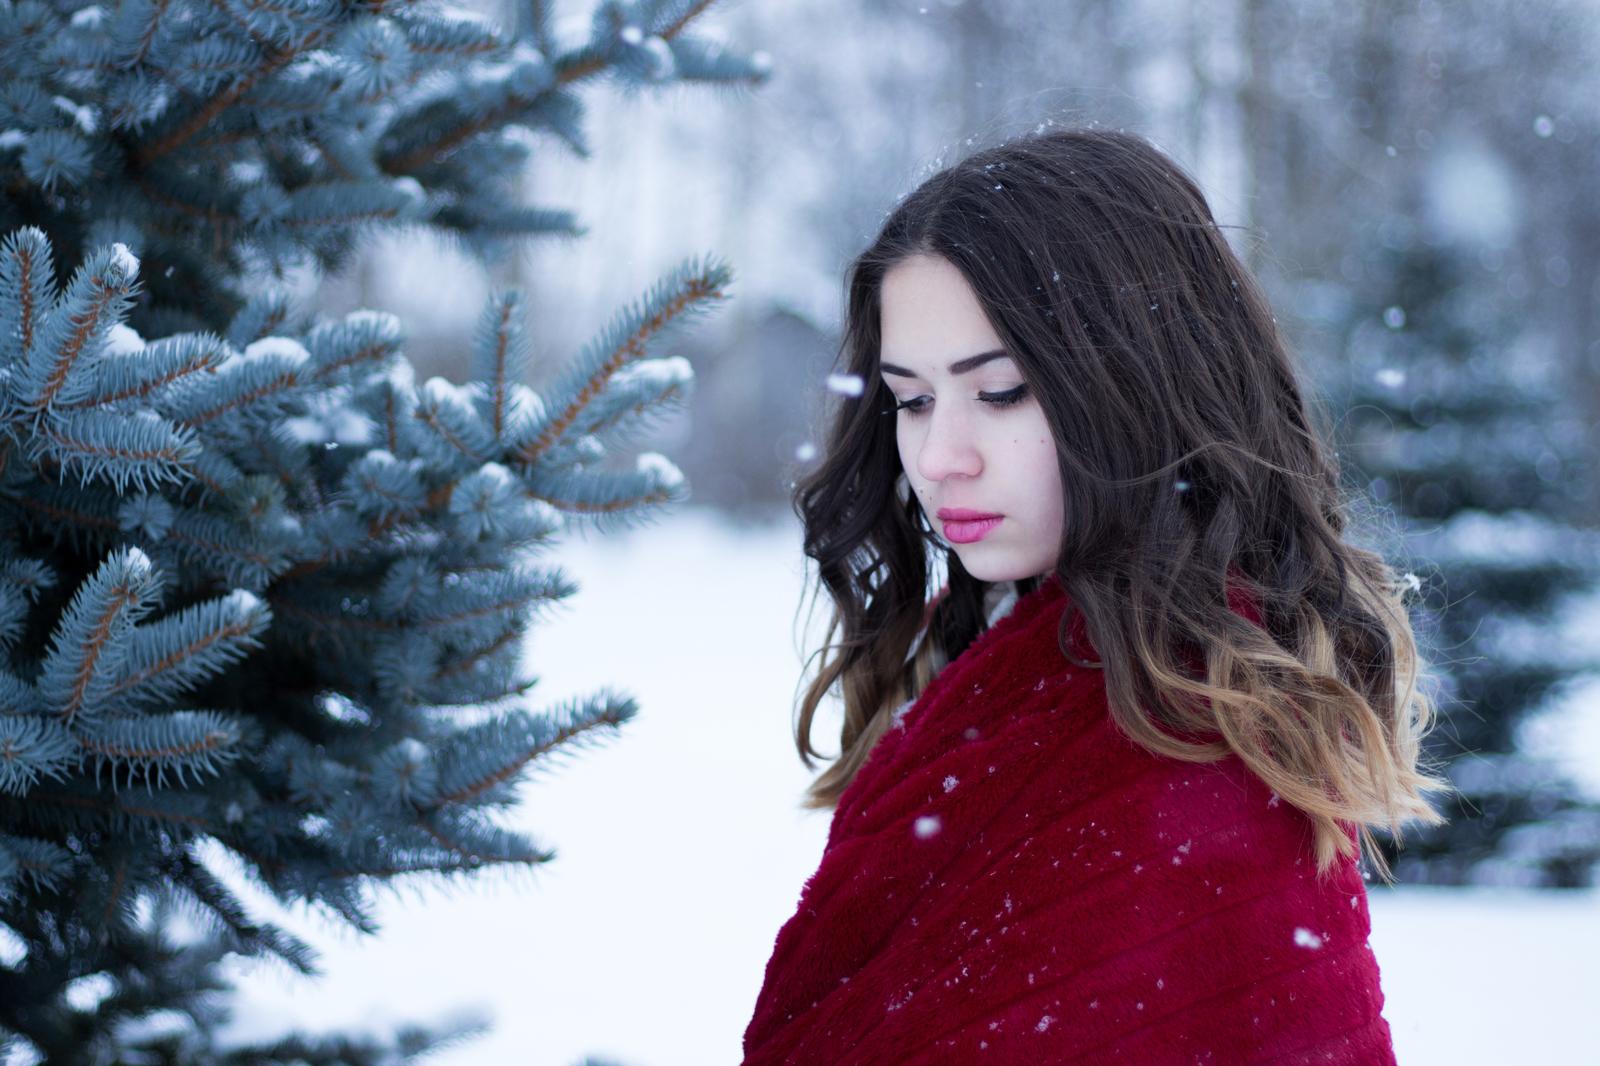 krasivie-fotografii-devushek-zimoy